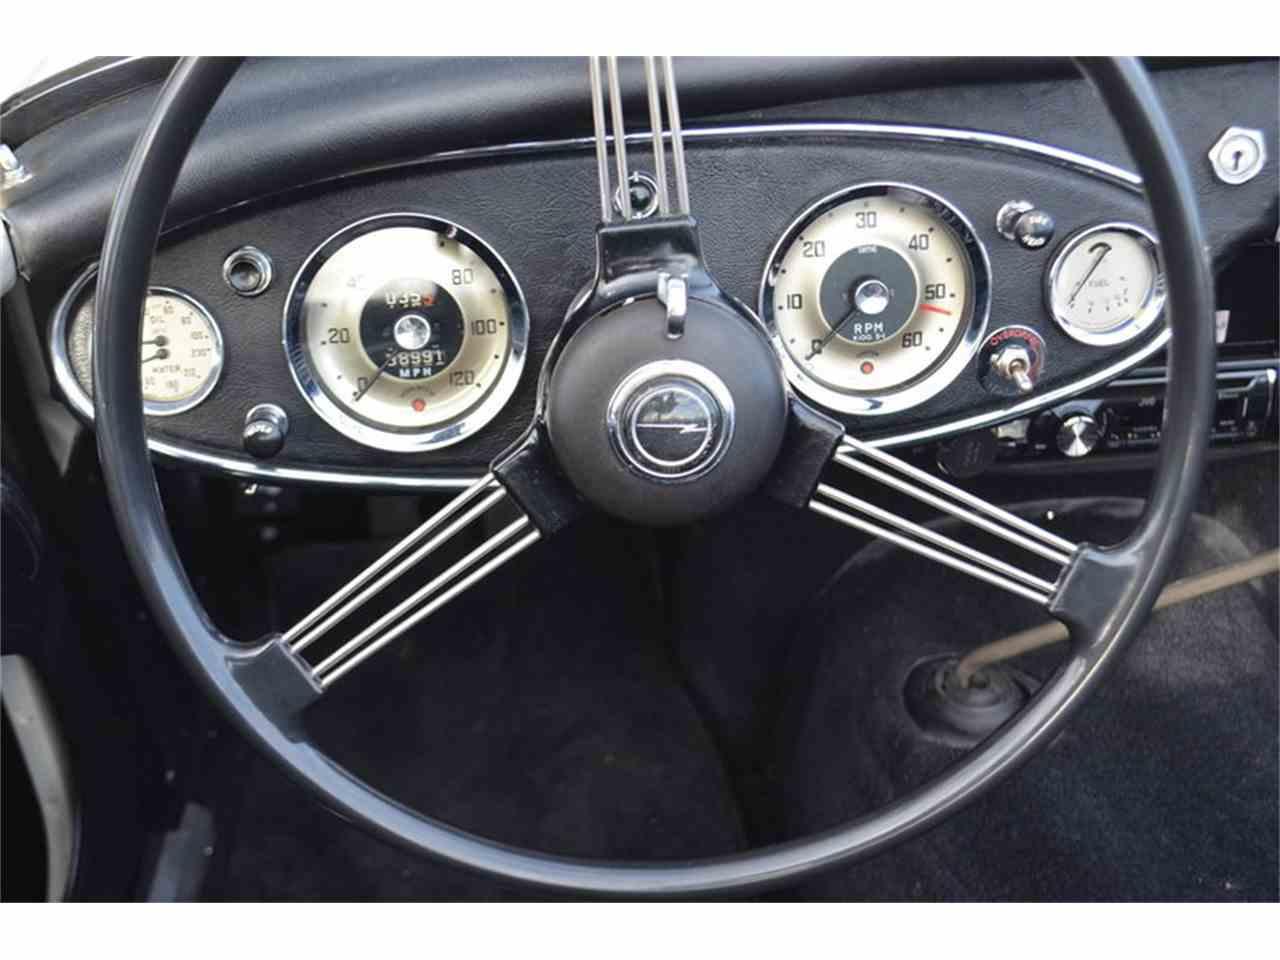 1962 Austin-Healey 3000 for Sale | ClassicCars.com | CC-1055558